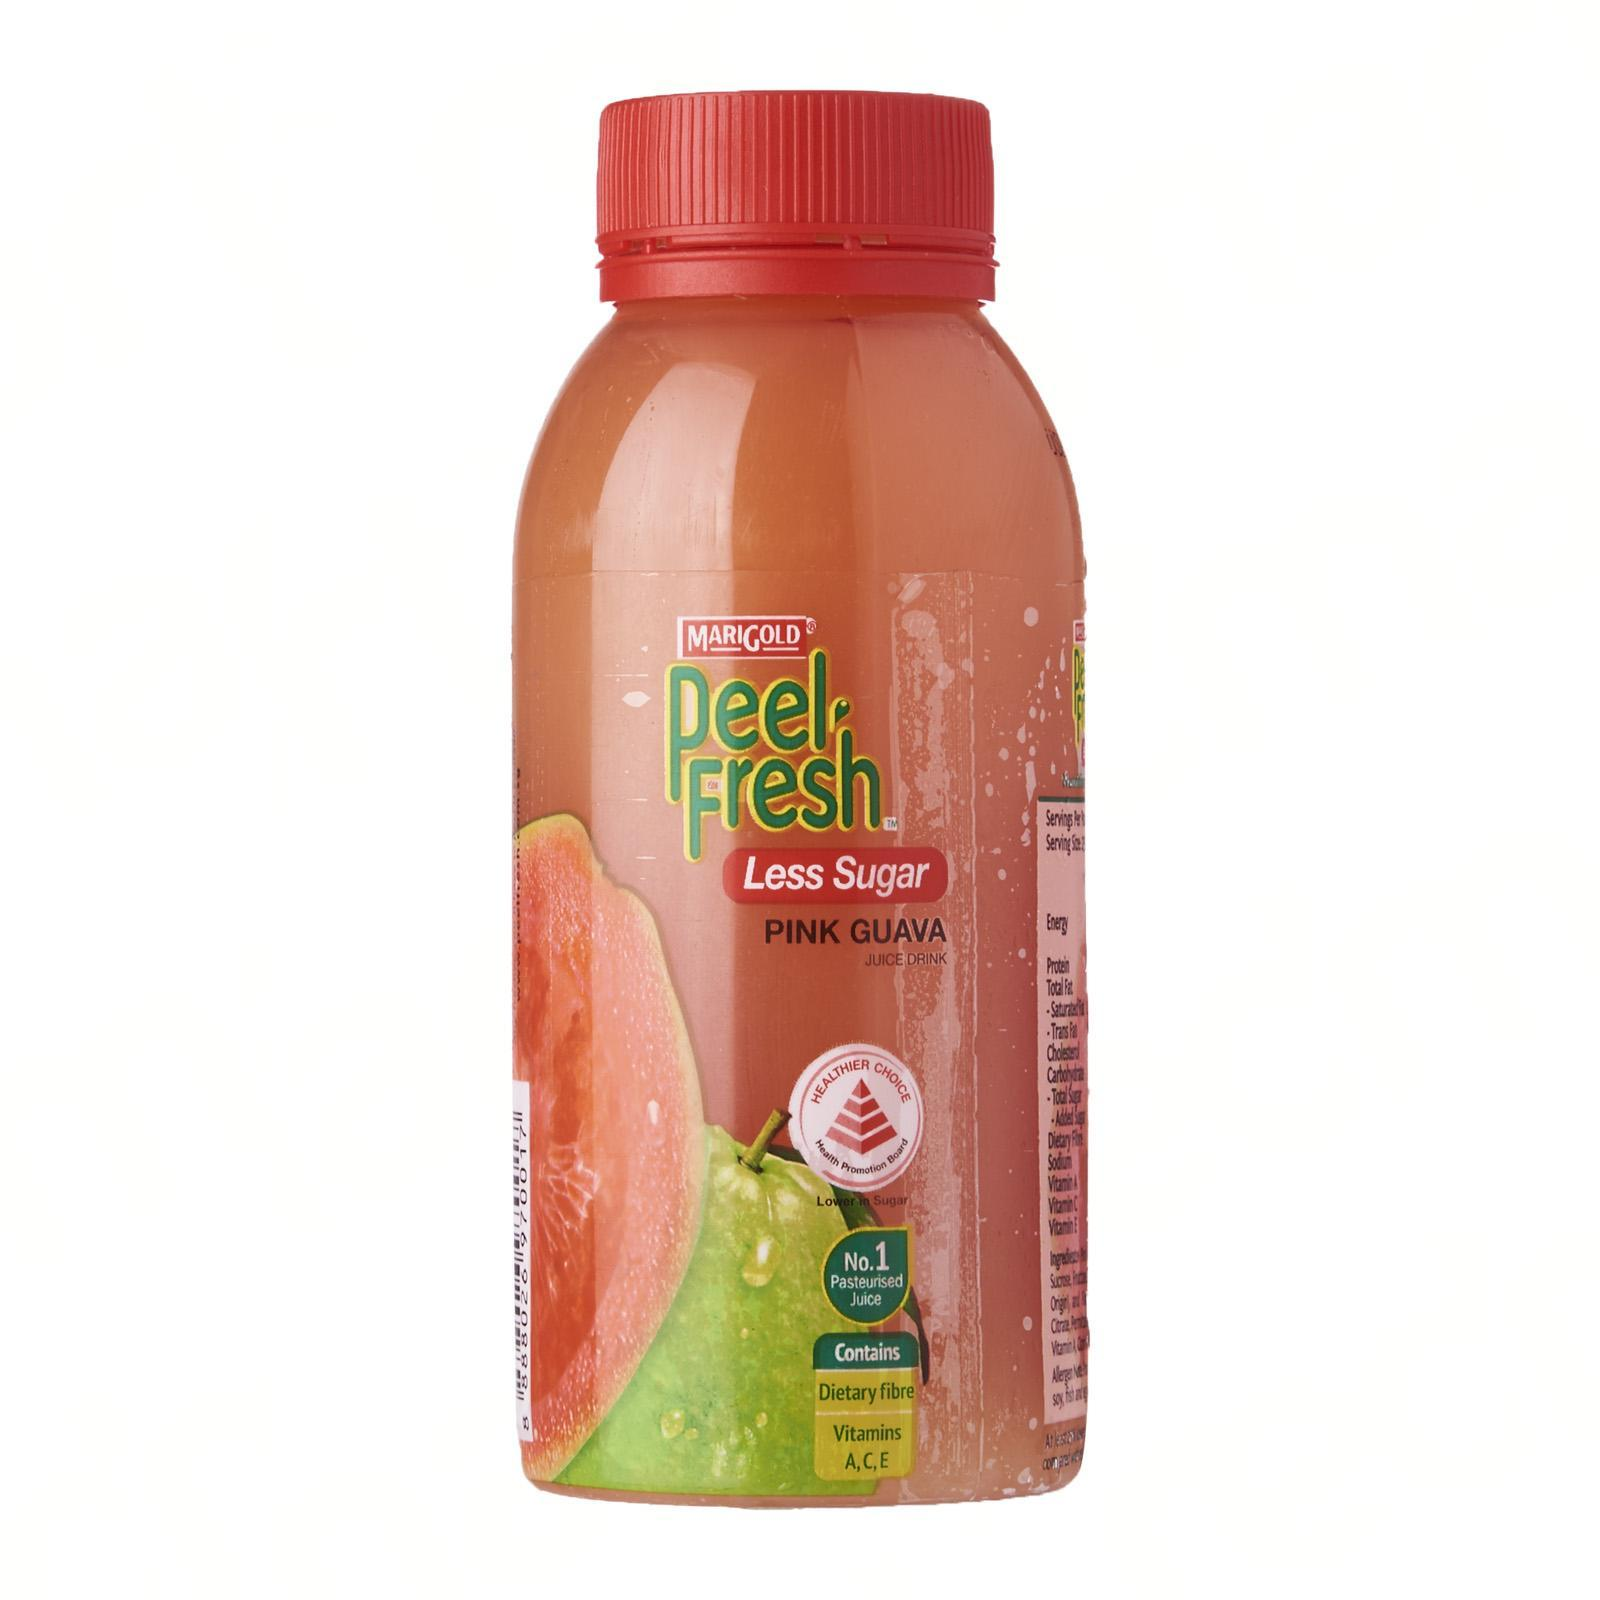 MARIGOLD PEEL FRESH Pink Guava Juice Drink - Less Sugar 250ml